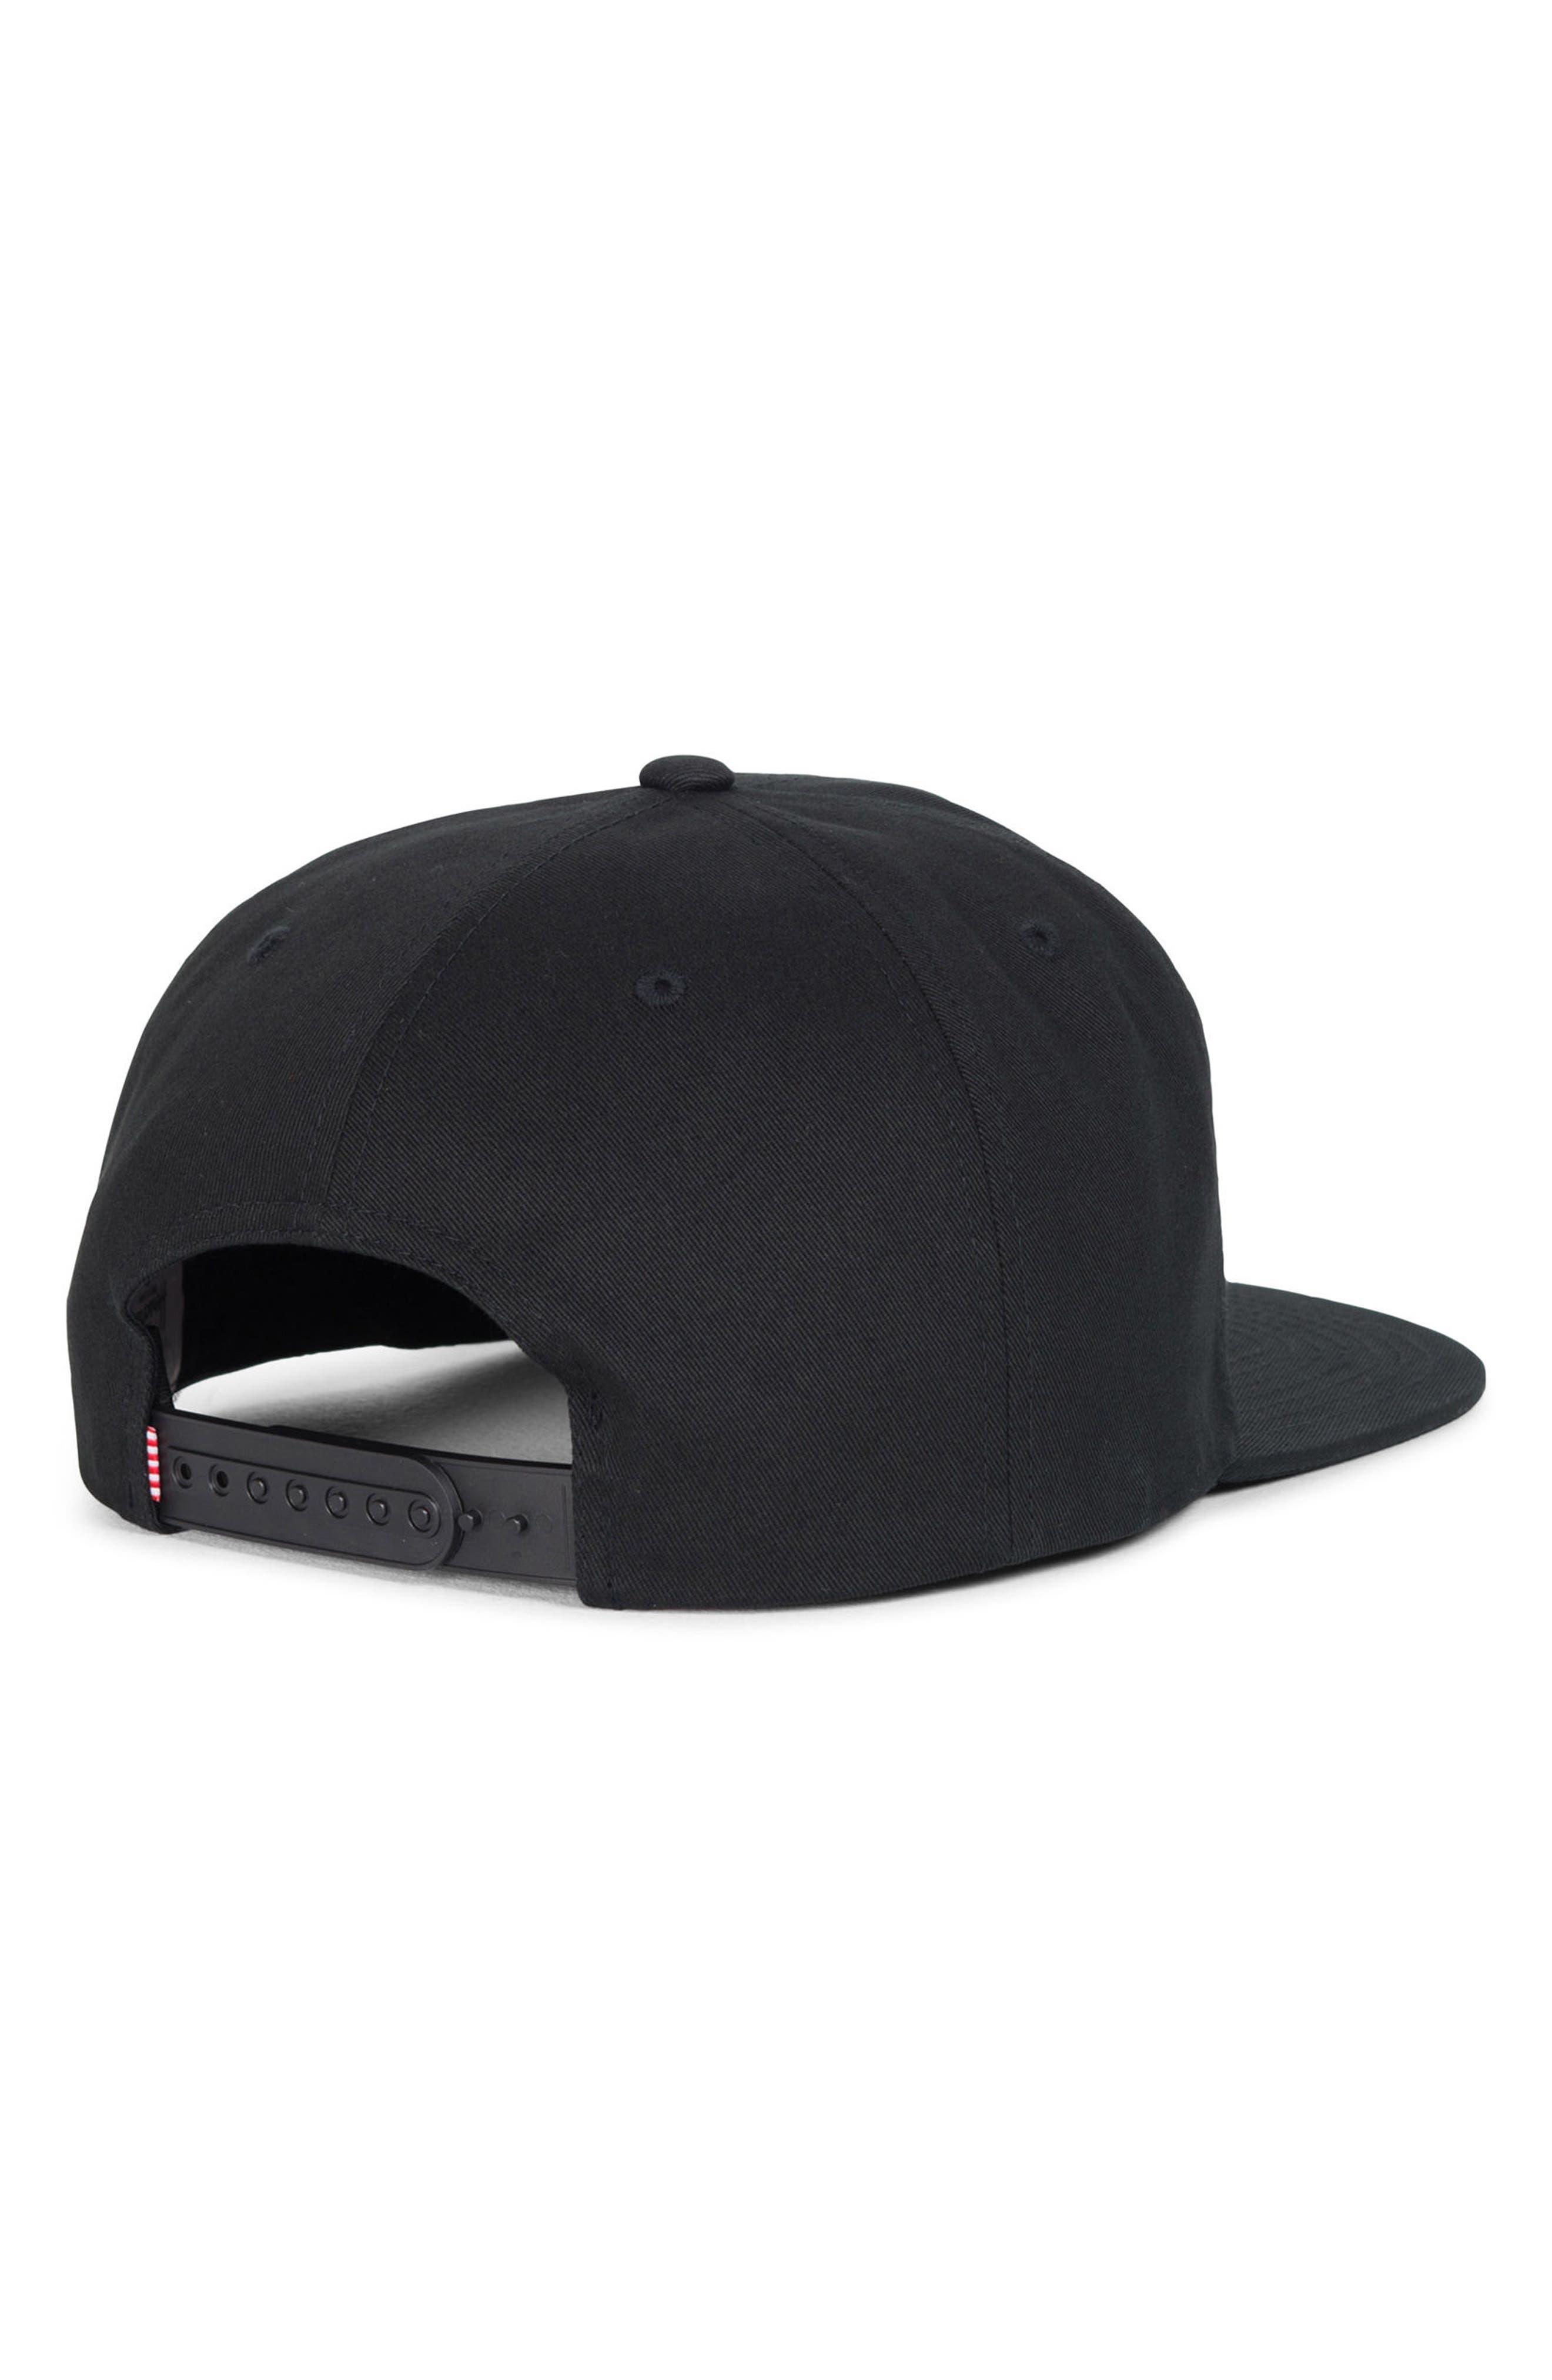 'Mosby' Snapback Baseball Cap,                             Alternate thumbnail 2, color,                             001